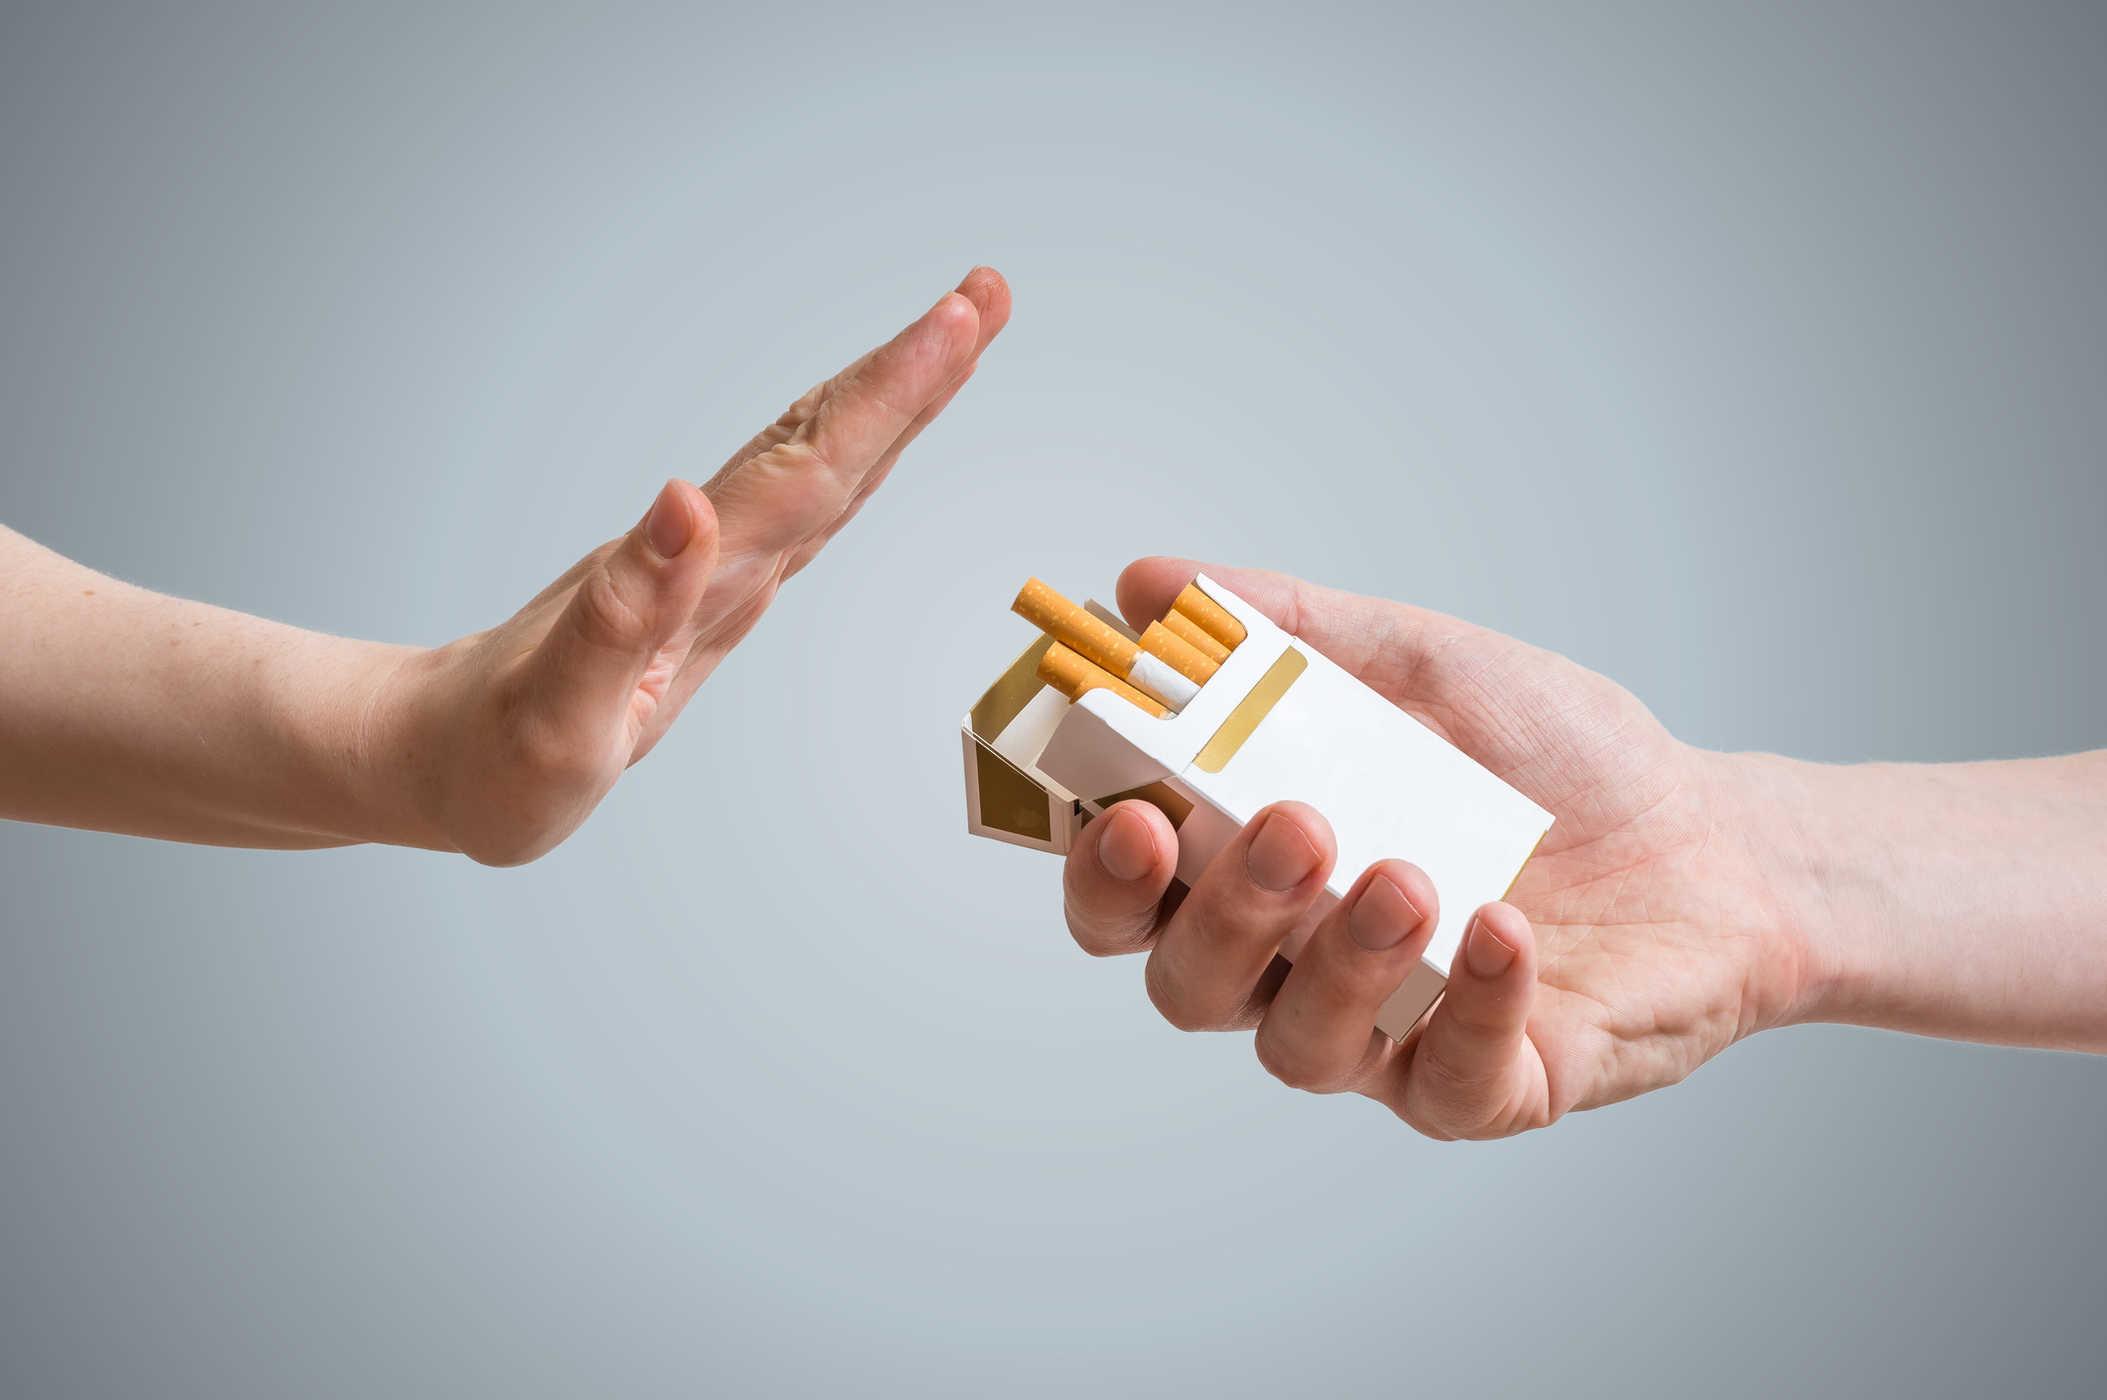 thuốc lá,sức khỏe